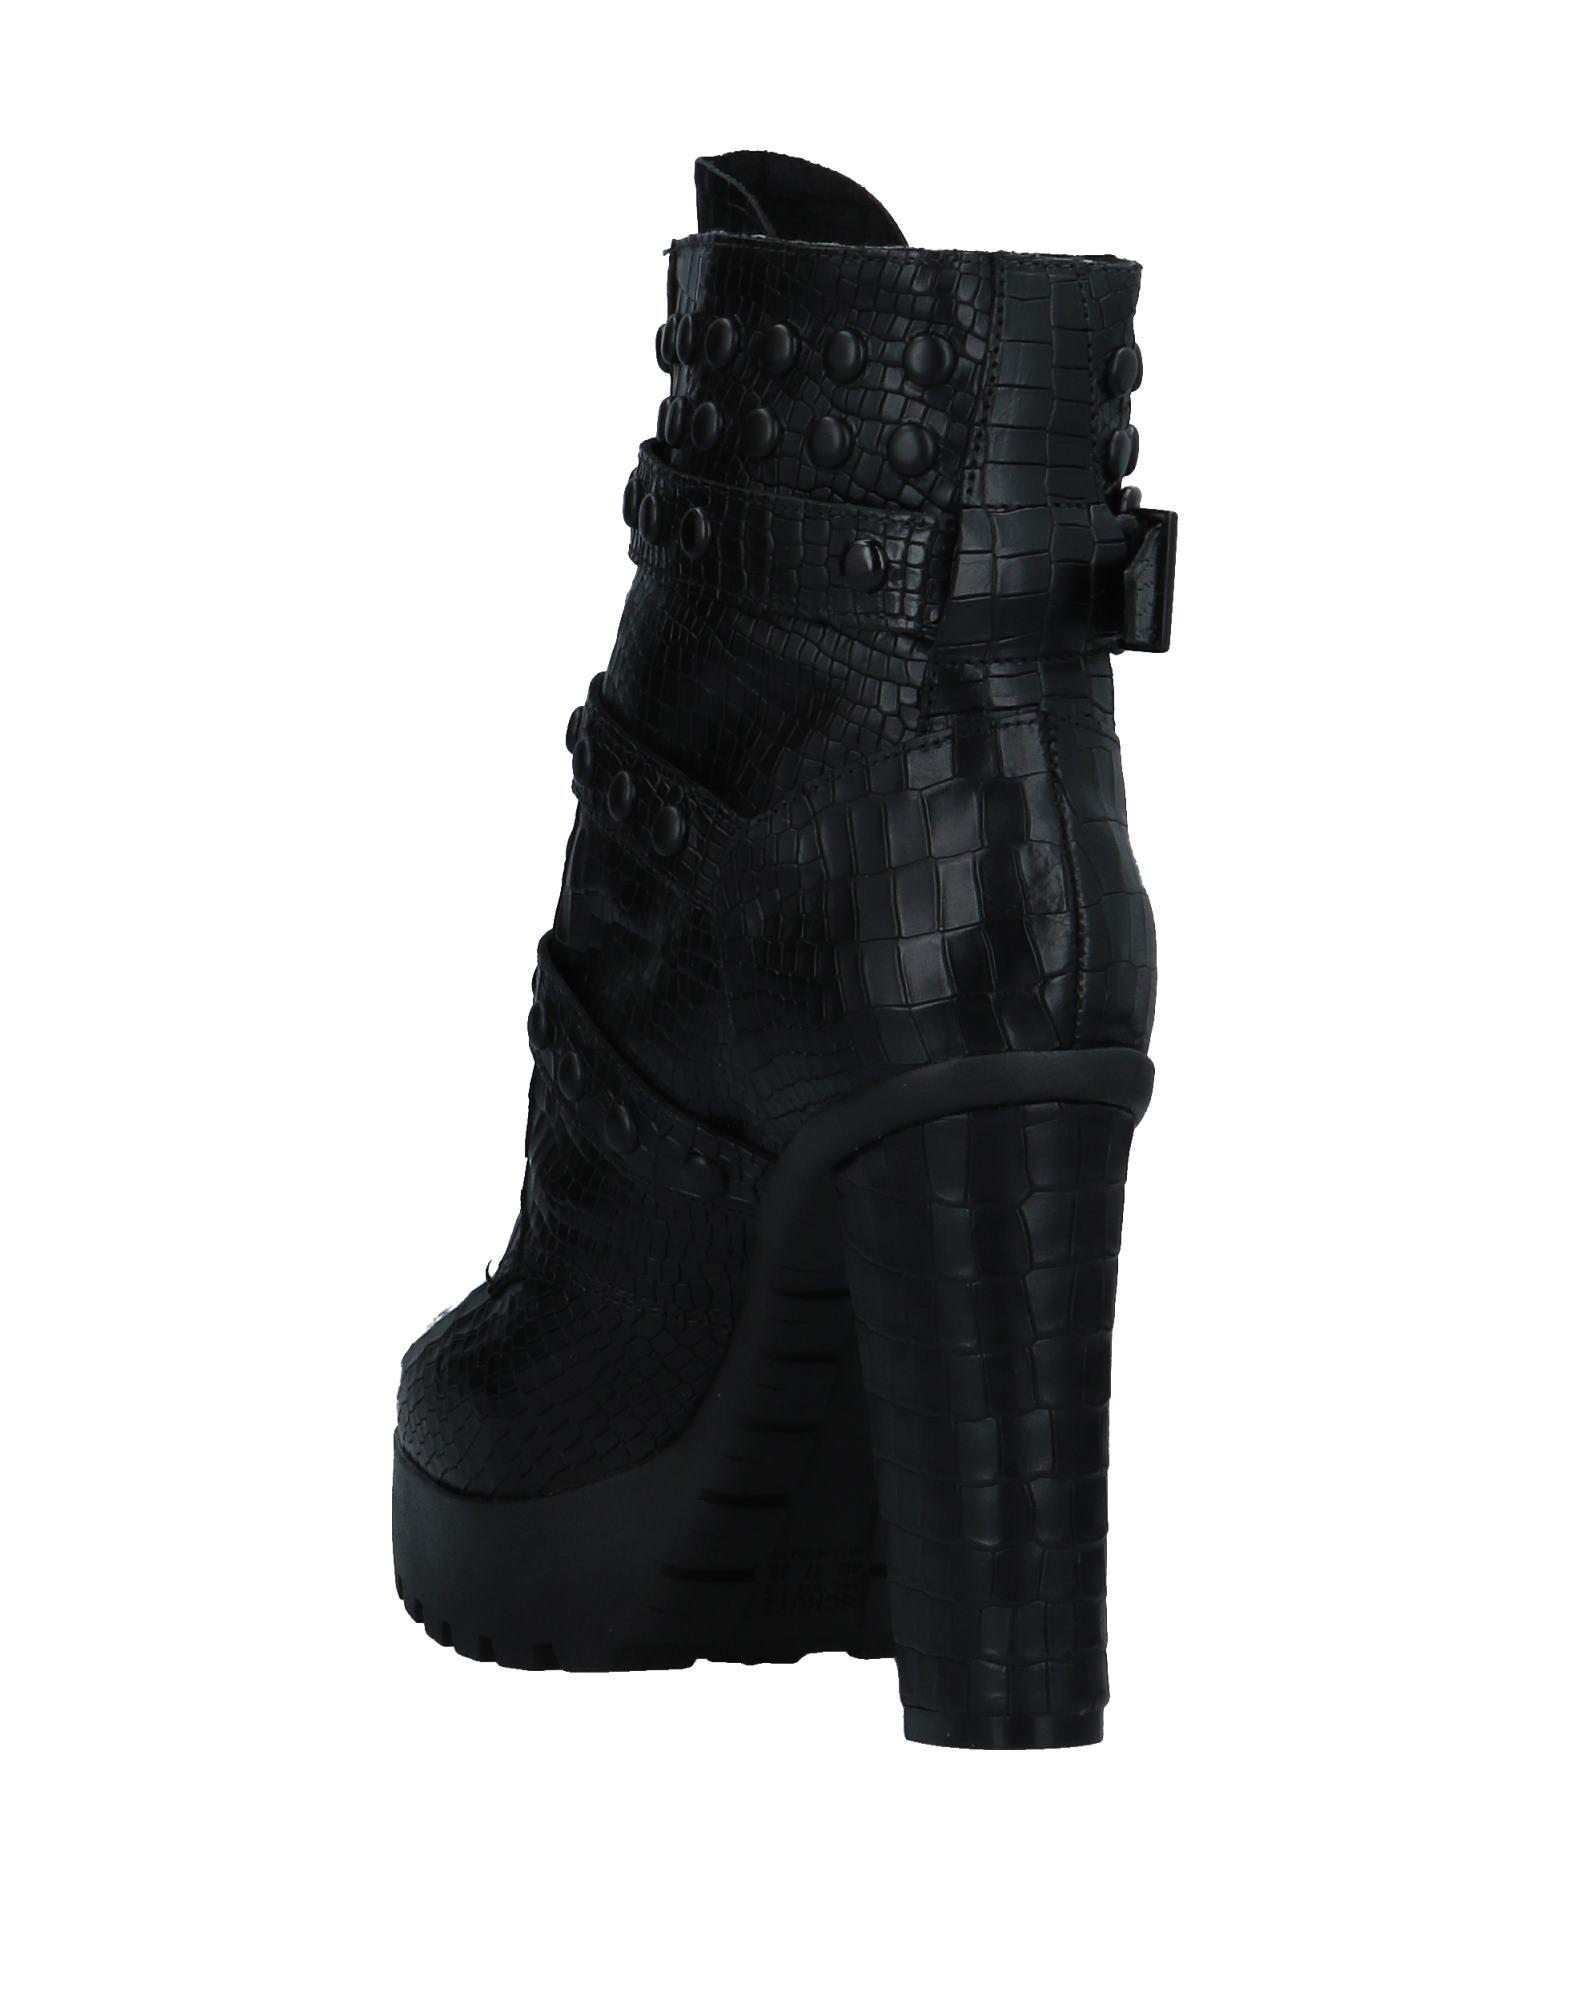 Stilvolle billige Schuhe Damen Schutz Stiefelette Damen Schuhe  11538277JP fe789e